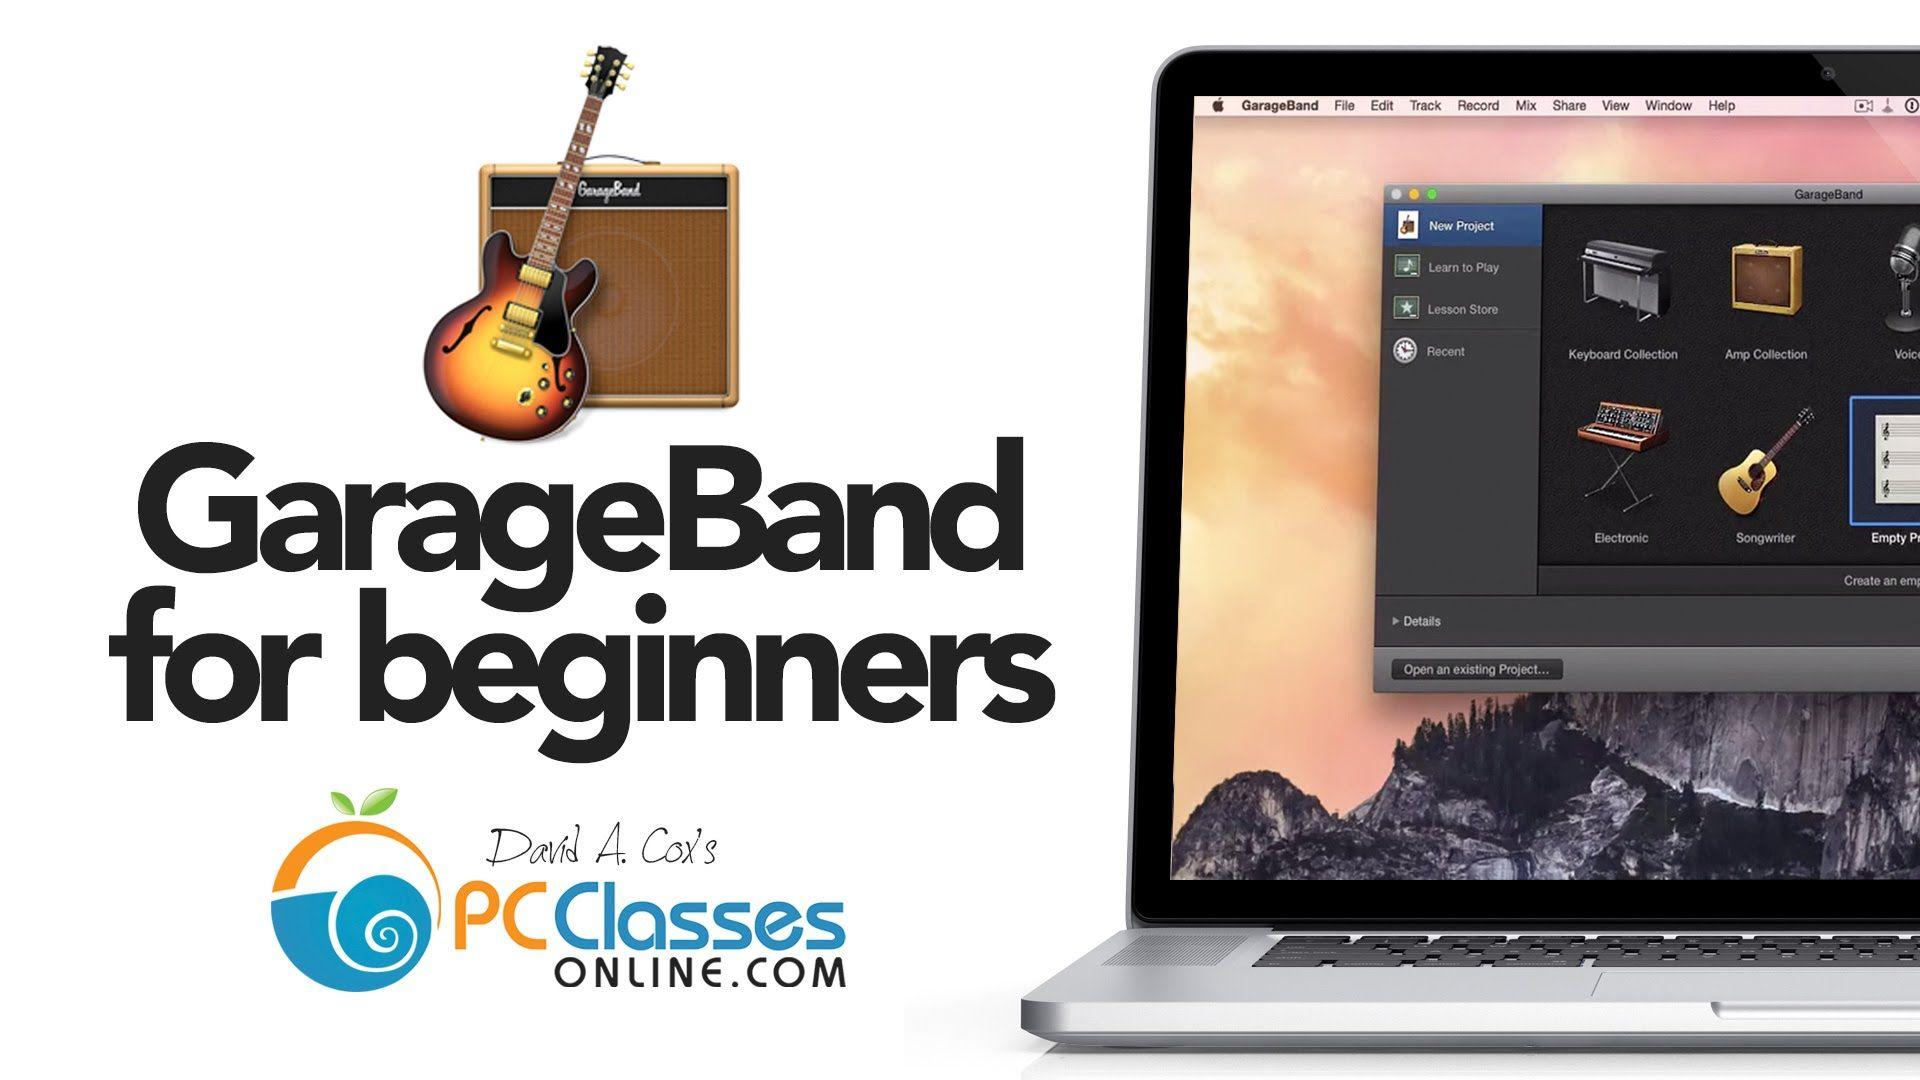 New to Garageband for Beginners Garage band, Beginners, Band